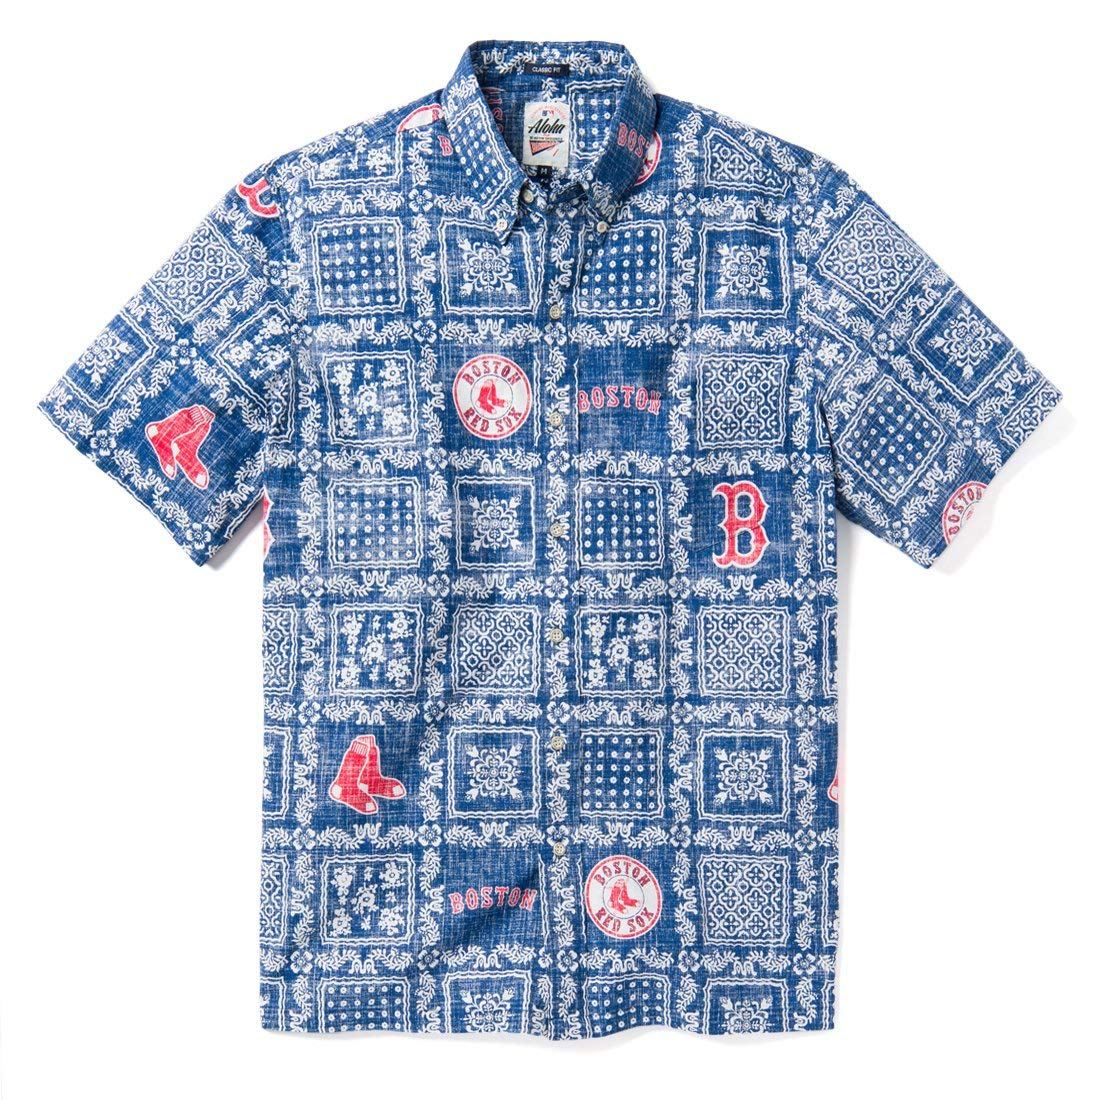 8ede7054 Reyn Spooner Men's Boston Red Sox MLB Classic Fit Hawaiian Shirt at Amazon  Men's Clothing store: